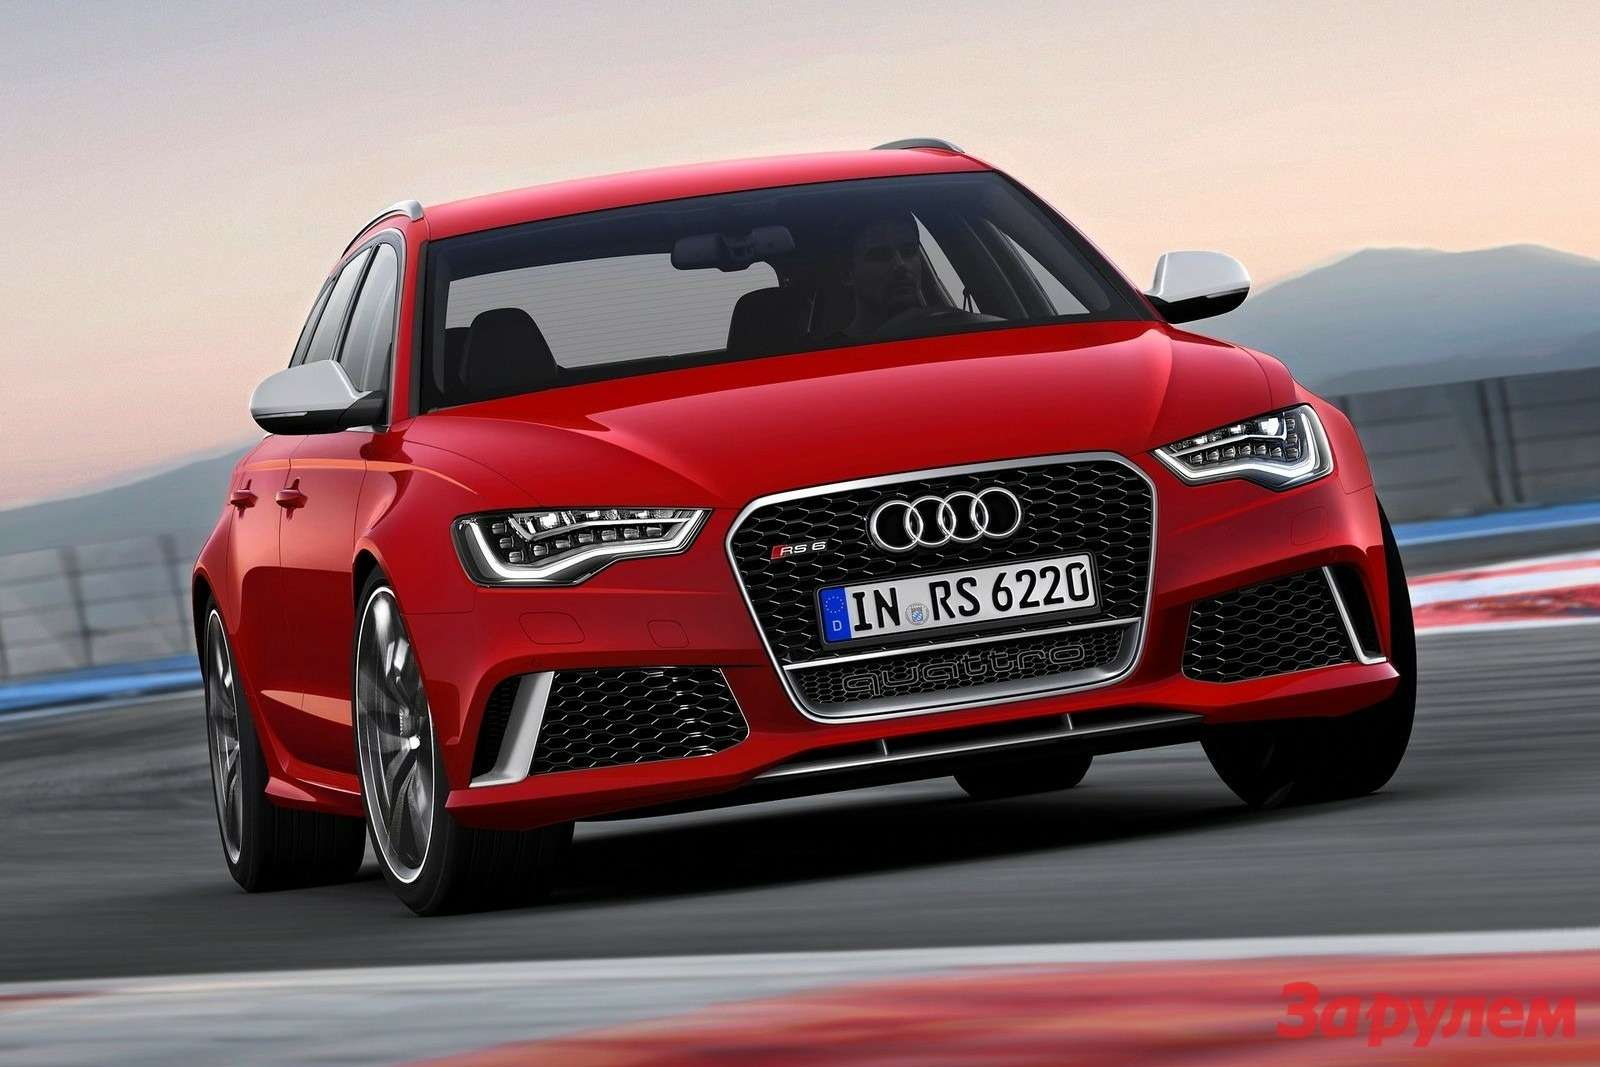 Audi-RS6_Avant_2014_1600x1200_wallpaper_01